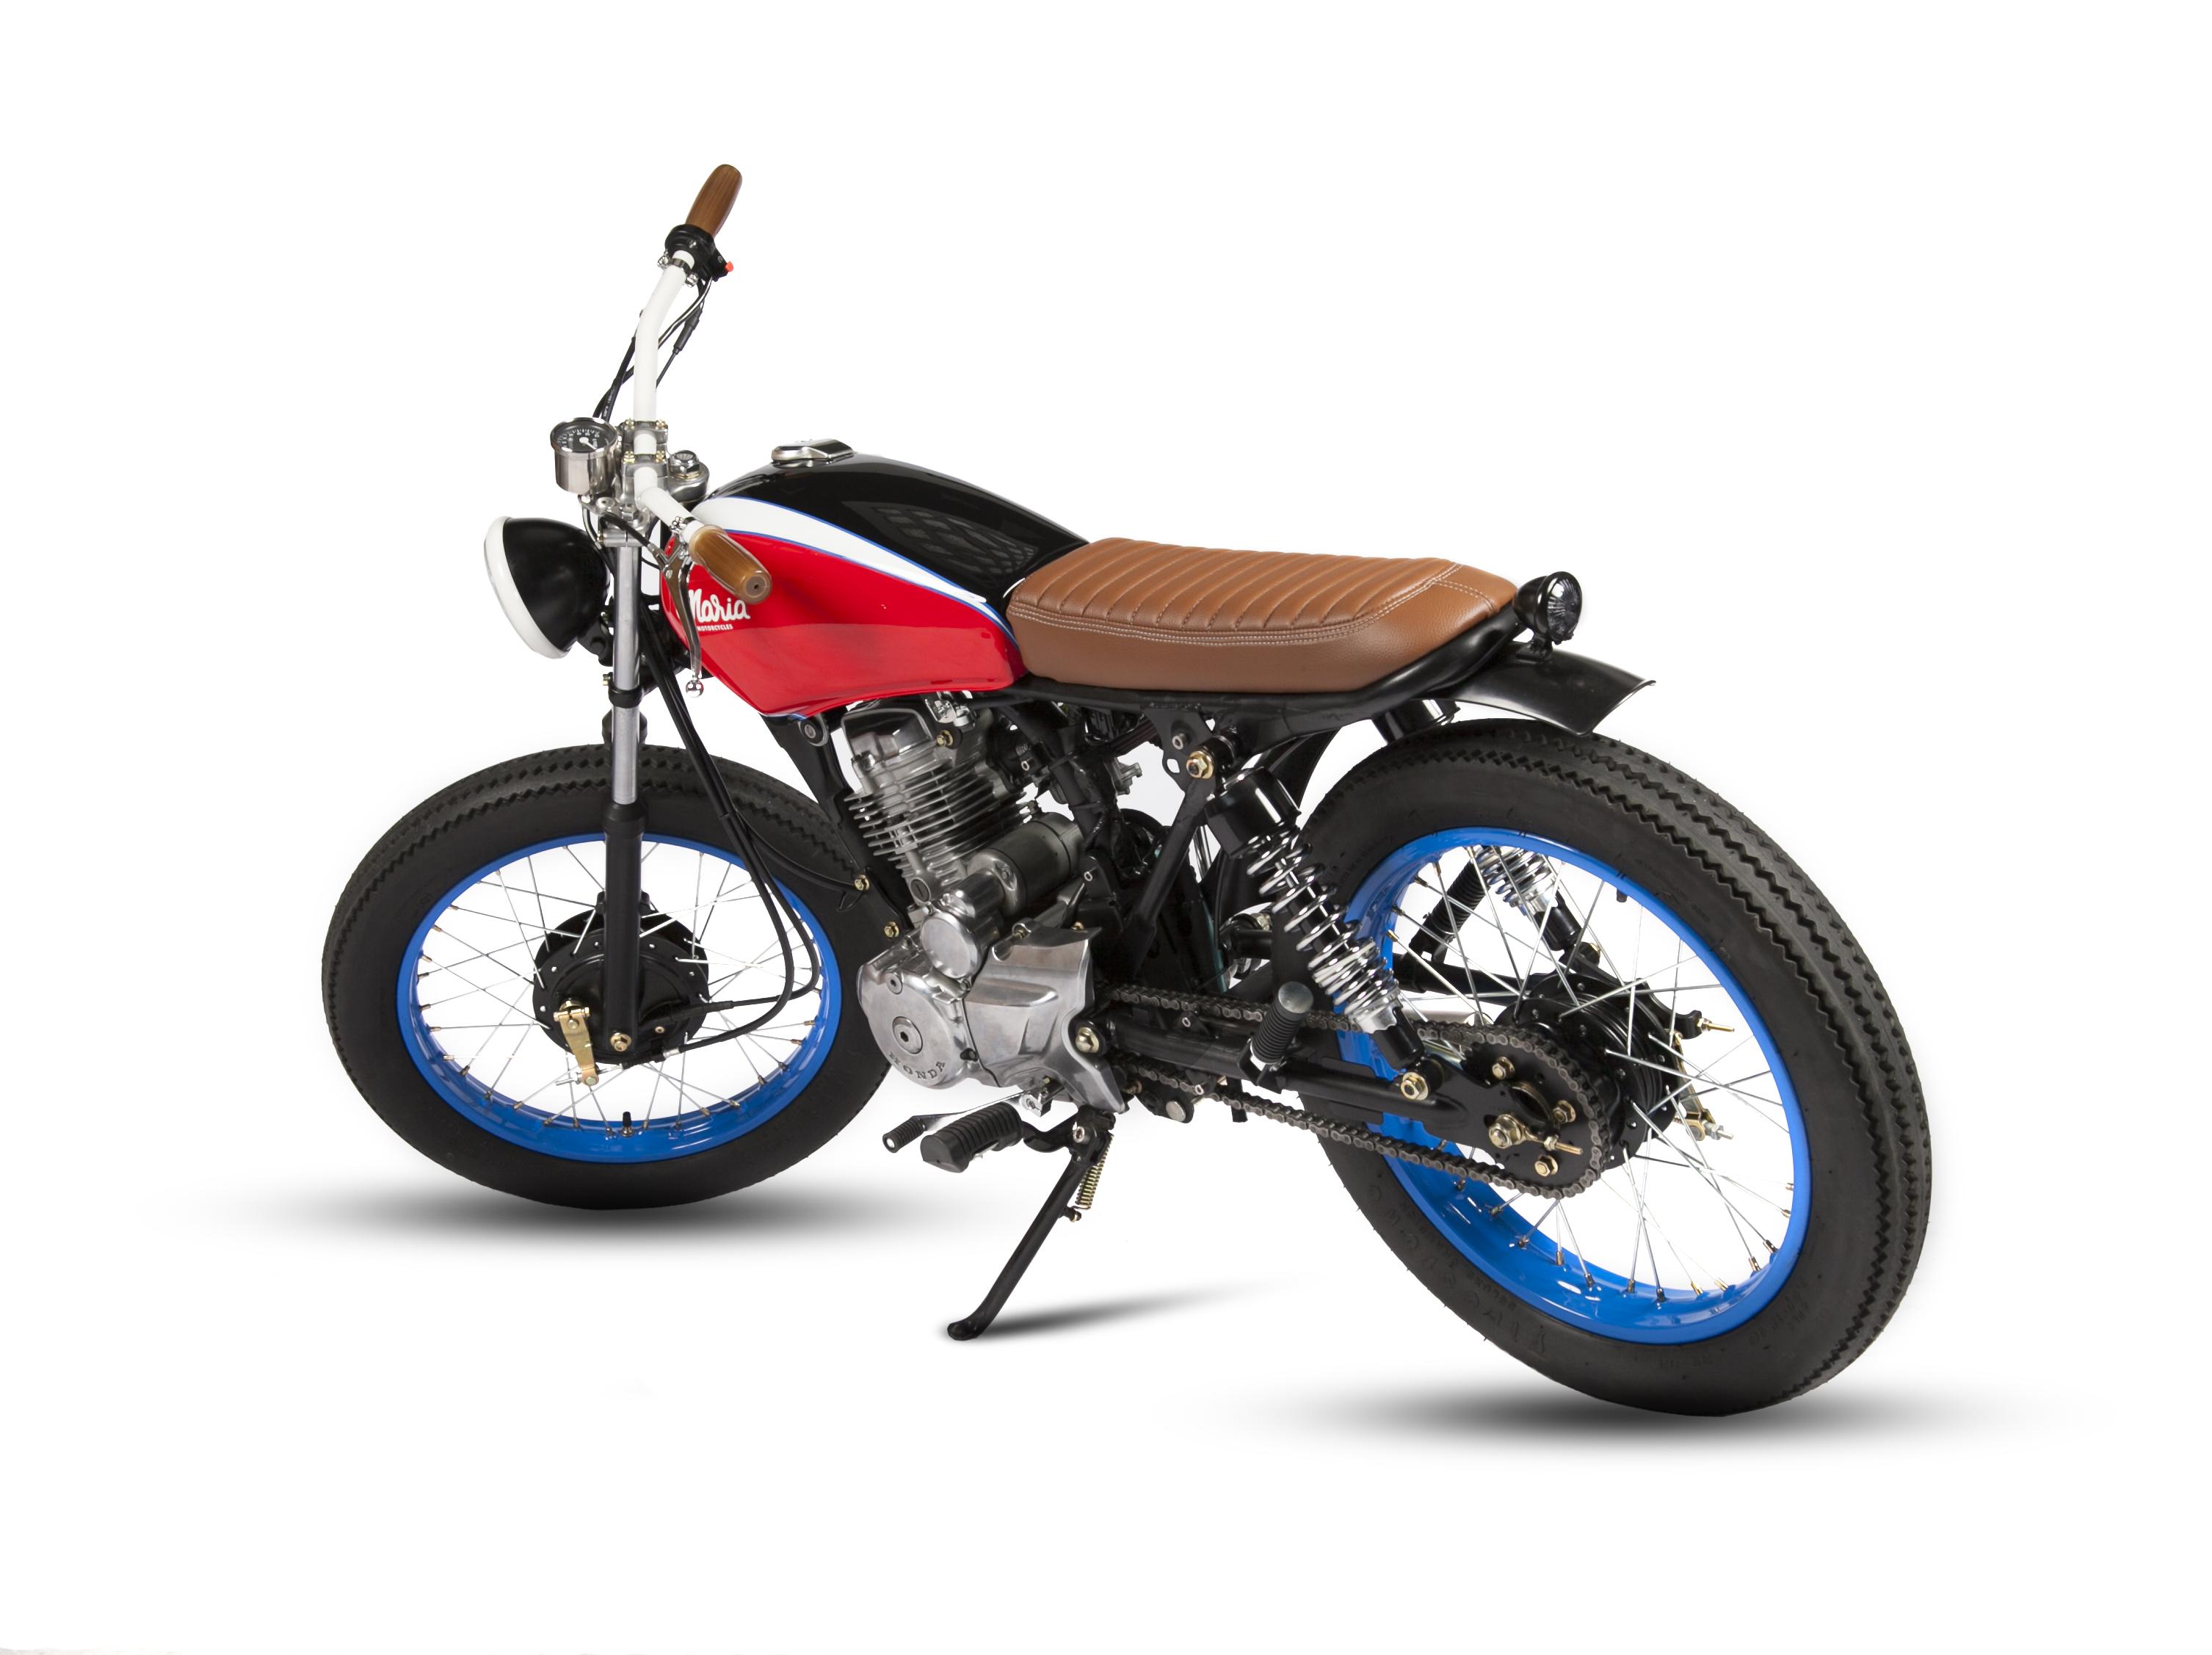 maria_motorcycles_honda_cg125_beladonna_3838